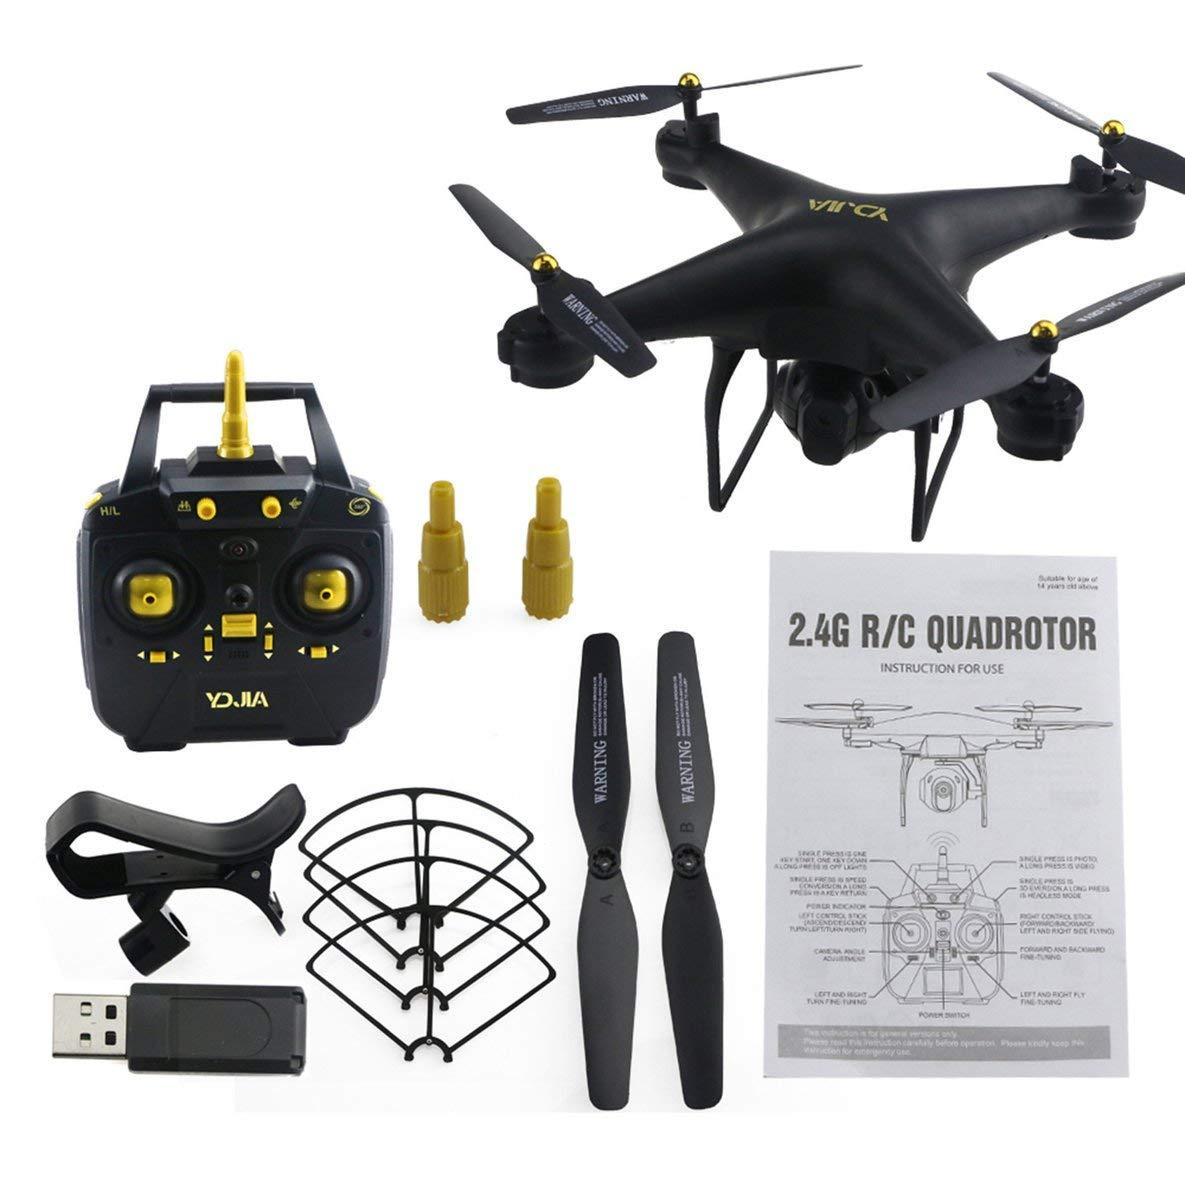 D68W-3 2.4G RC Selfie Smart Drone Quadcopter Aviones UAV con 720P WiFi FPV Cámara de Video en Vivo Altitud Mantener 360 ° Flips